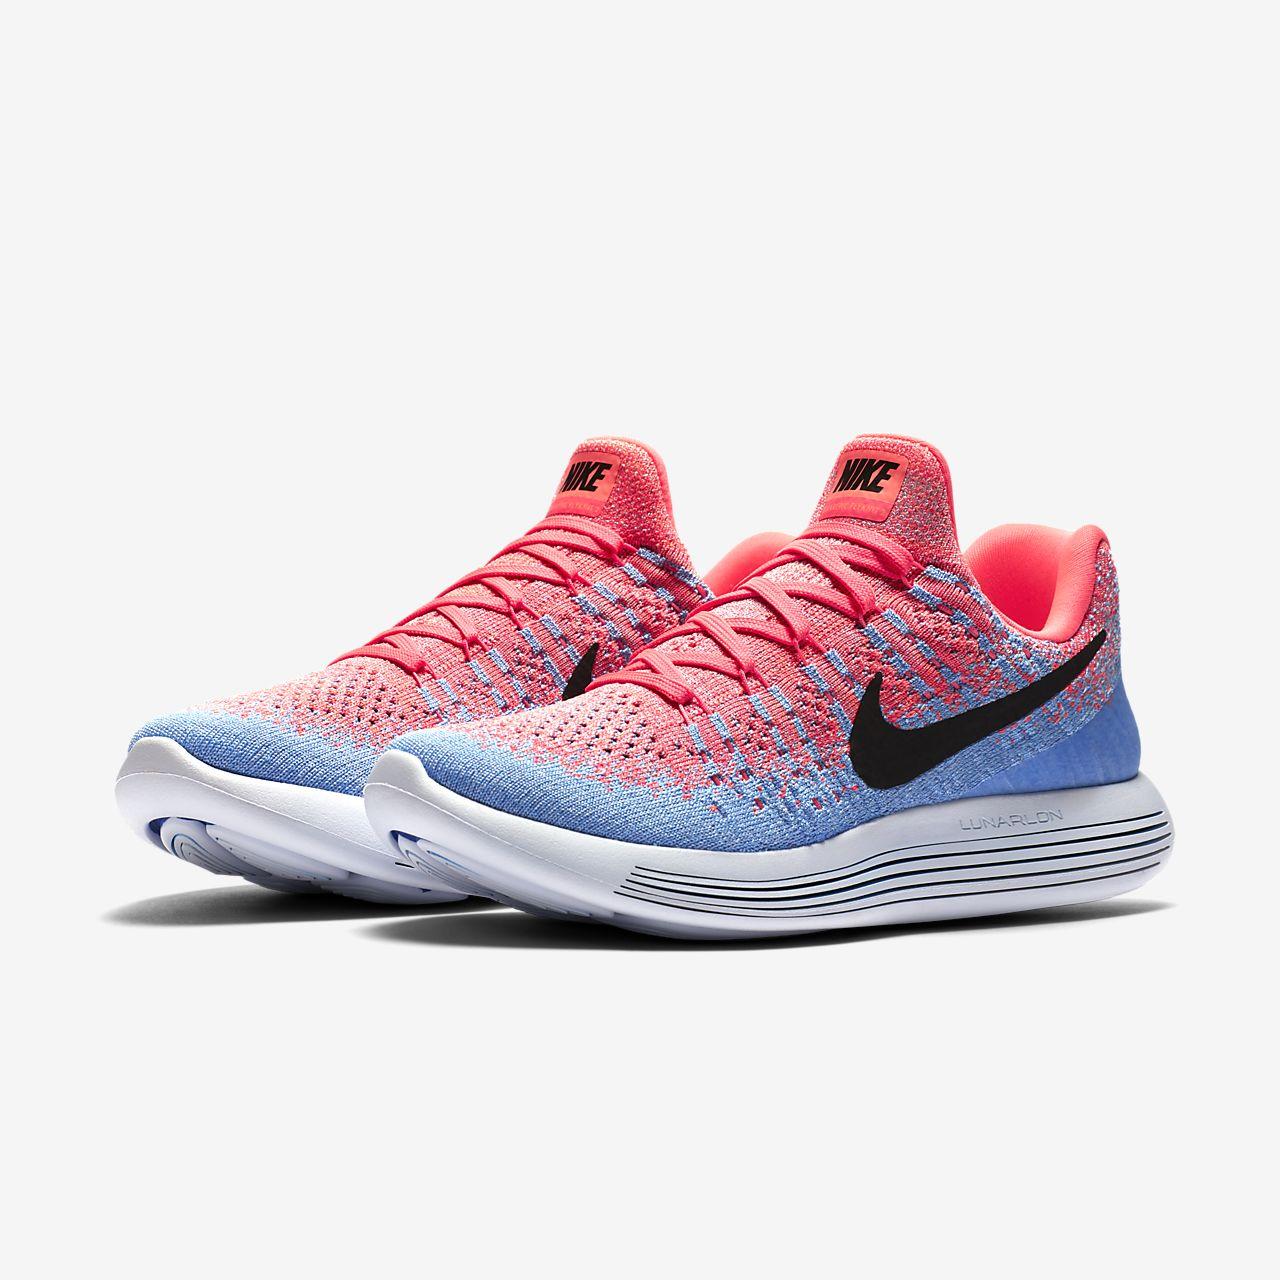 quality design 671d2 0a836 Nike LunarEpic Low Flyknit 2 Women's Running Shoe